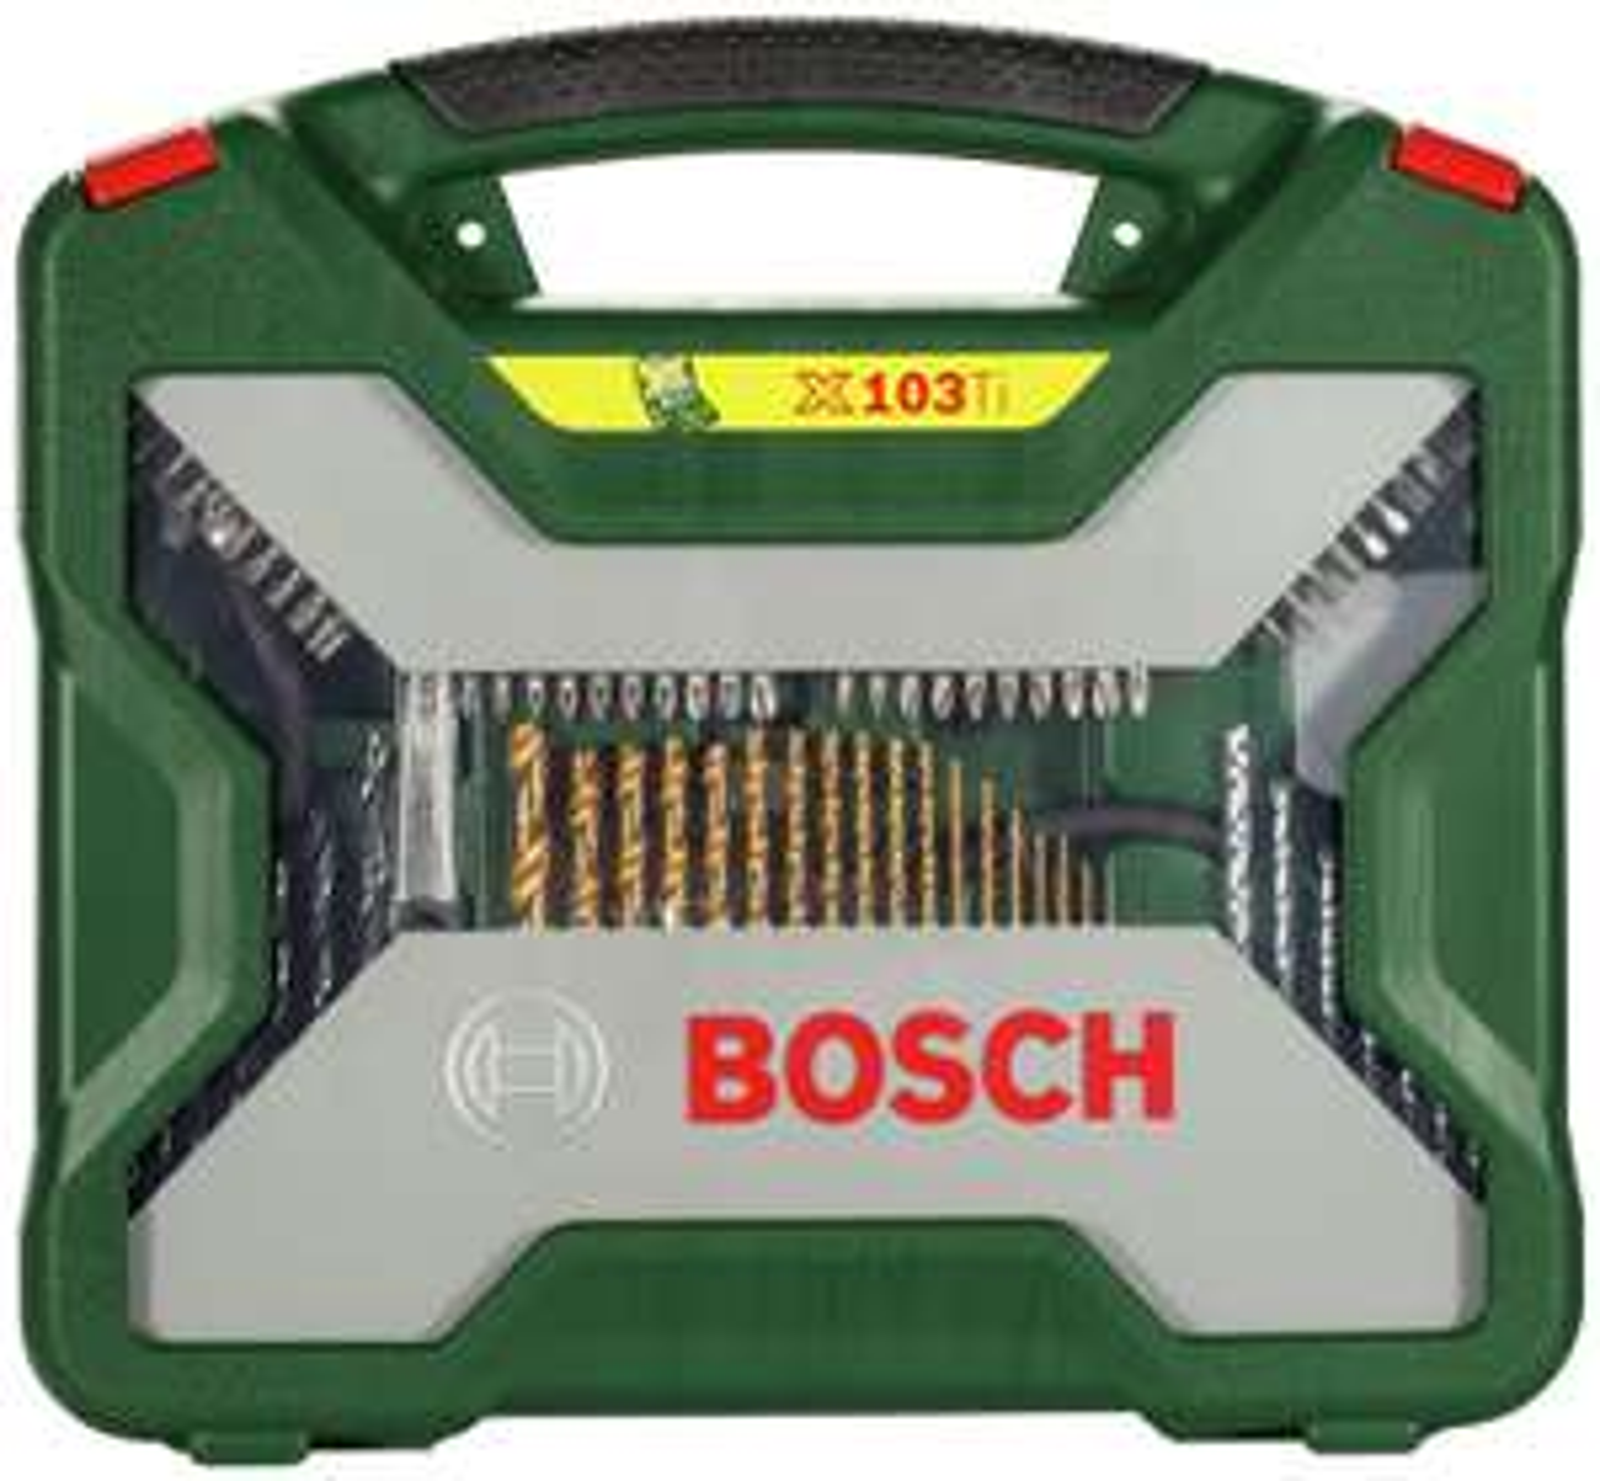 Bosch 103 Piece Titanium Drill and Screwdriver Accessory Set @ Argos eBay Store - £19.99